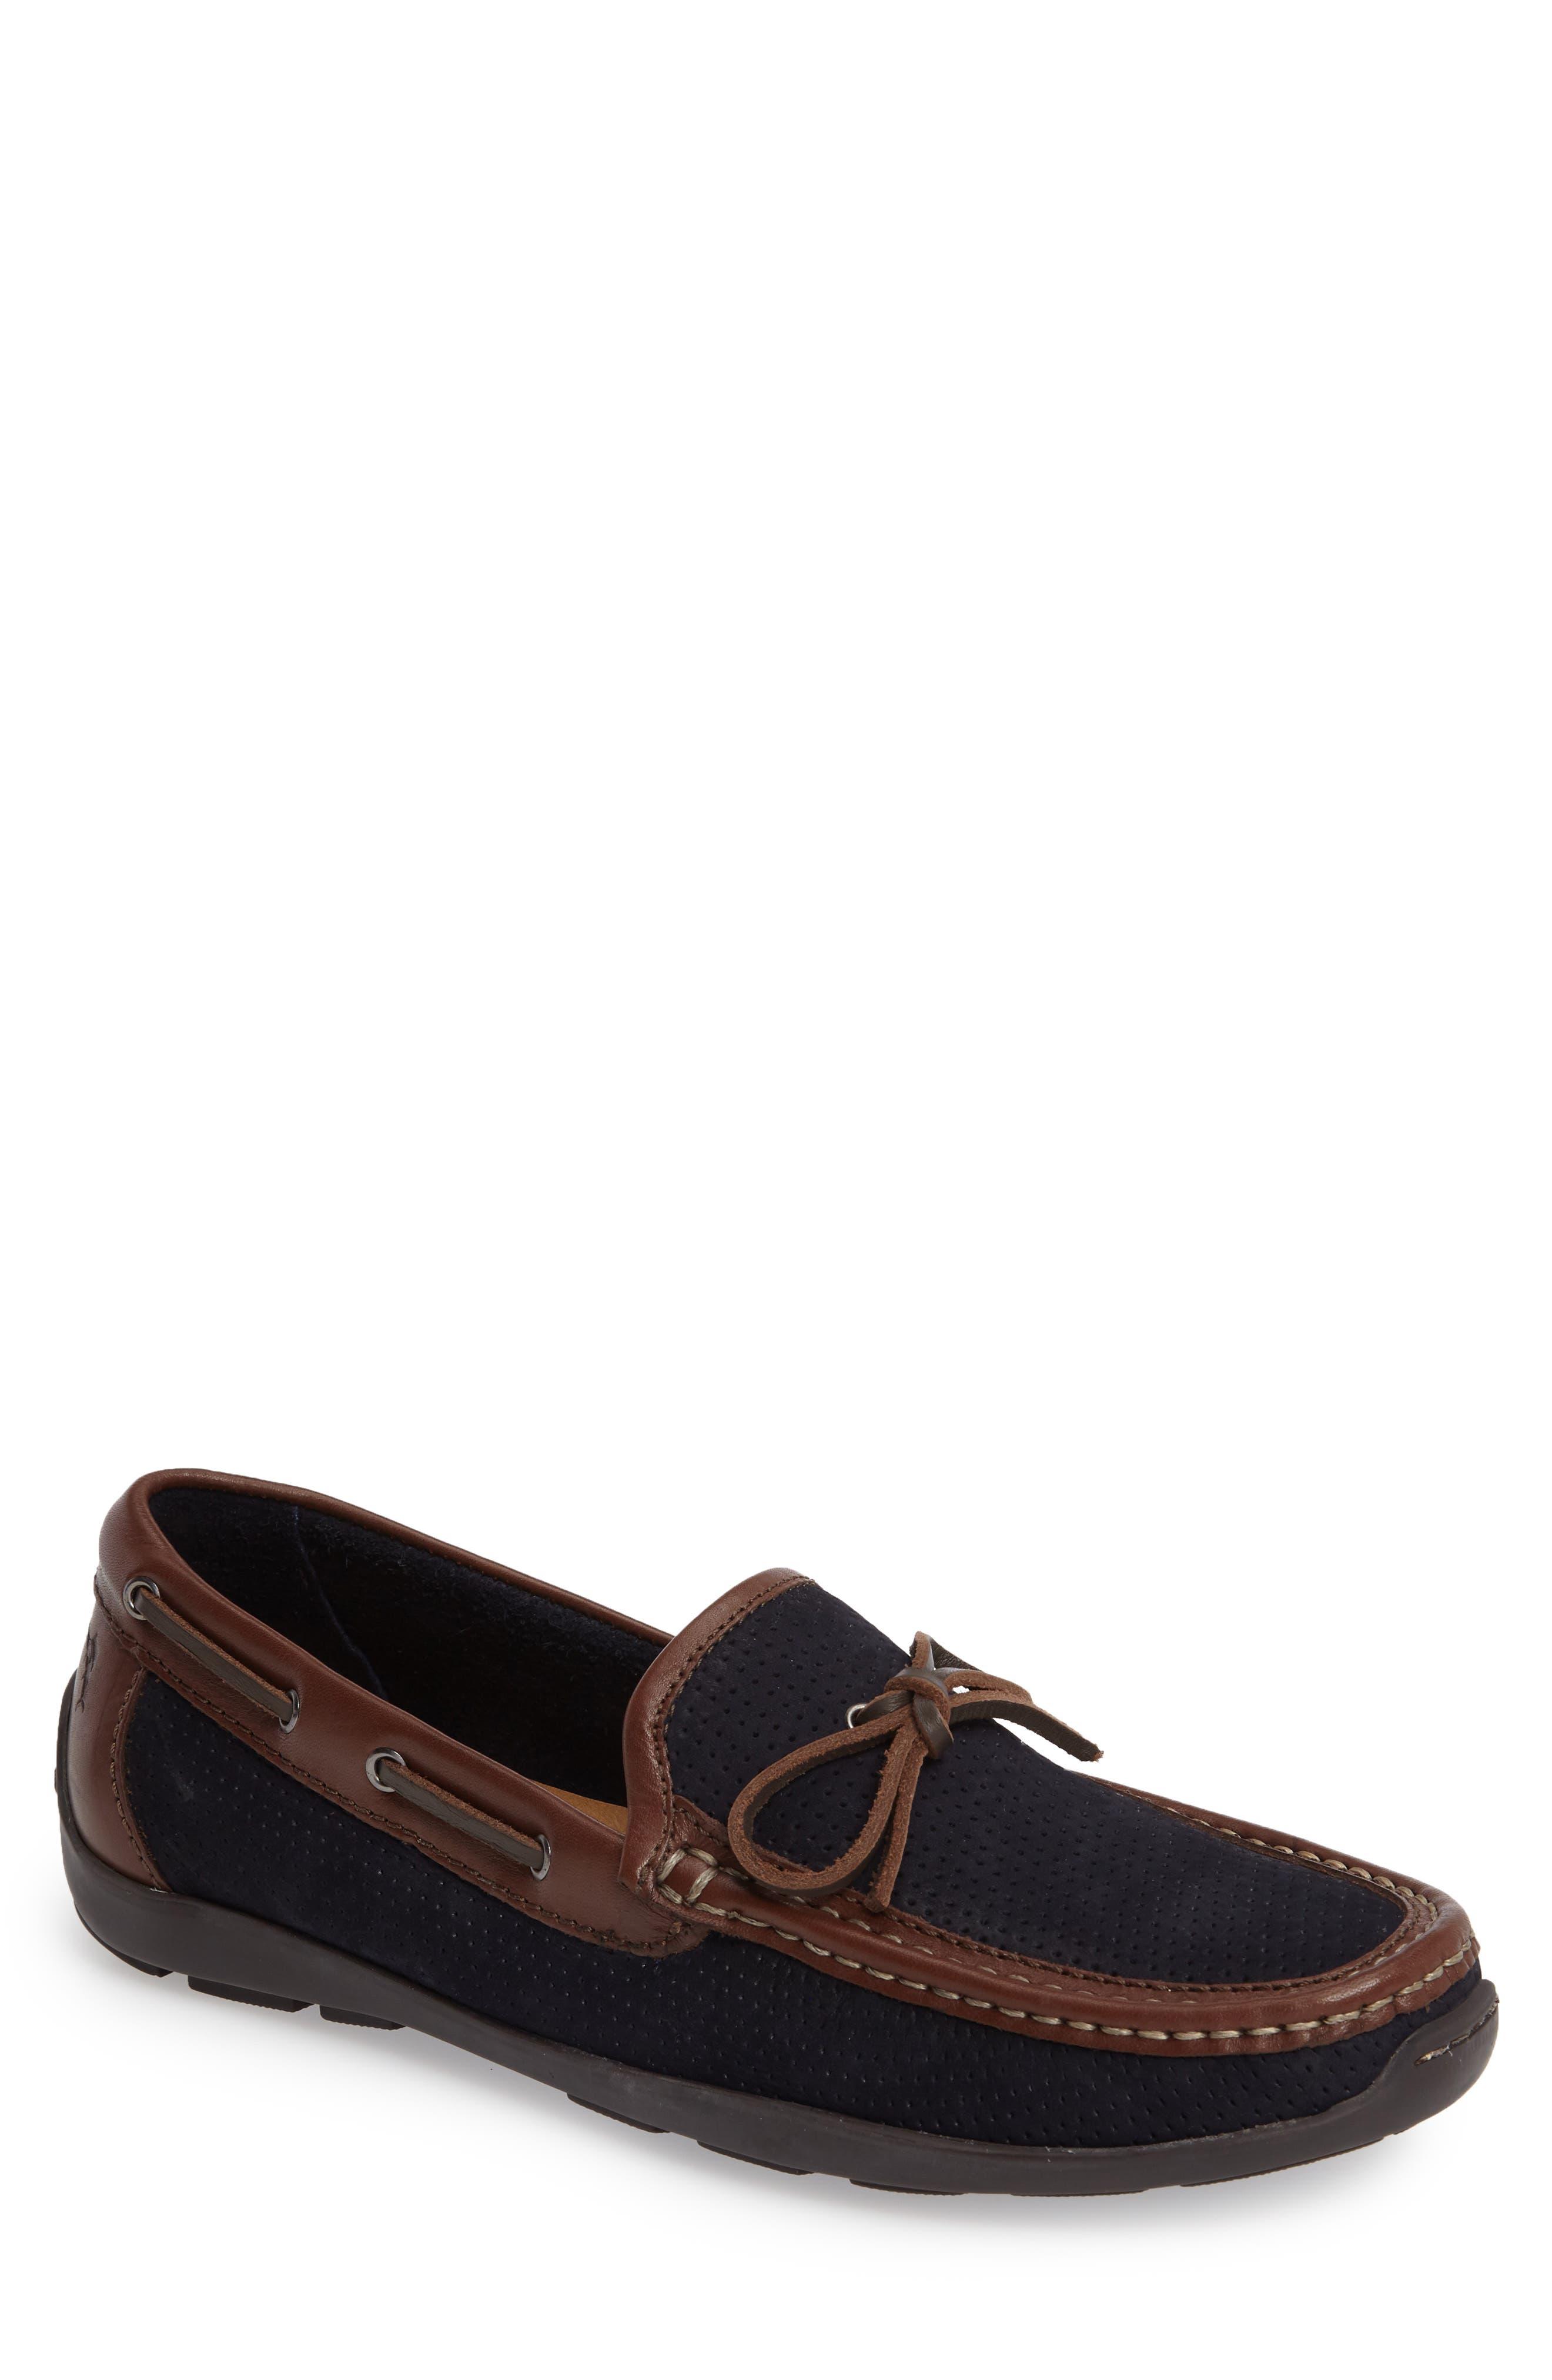 Odinn Driving Shoe,                         Main,                         color, Navy Nubuck Leather